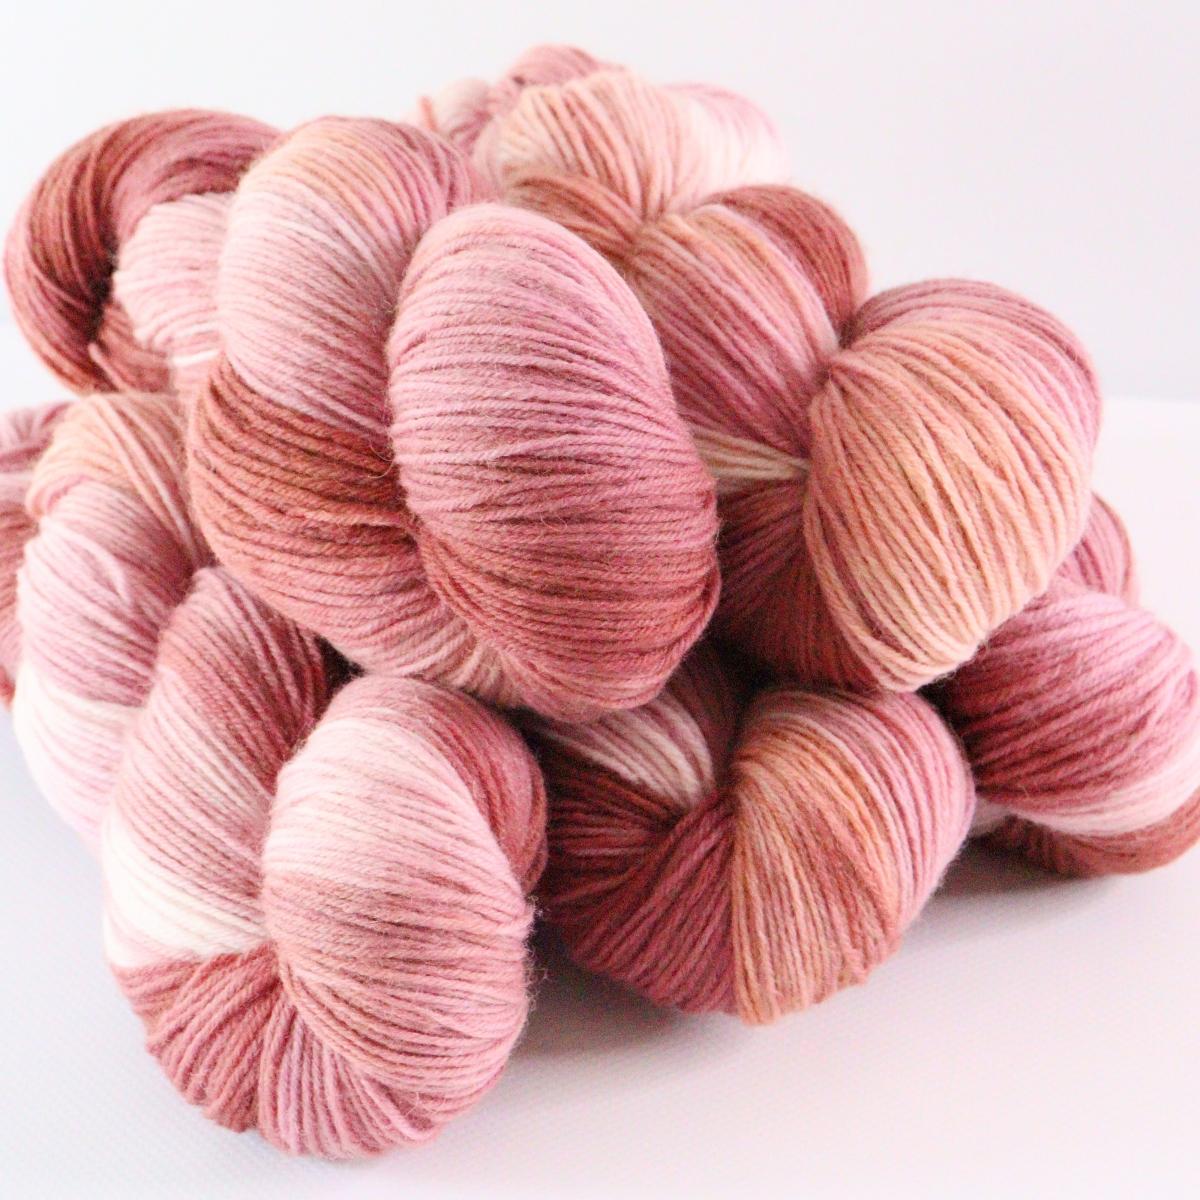 woodico.pro hand dyed yarn 075 1200x1200 - Hand dyed yarn / 075